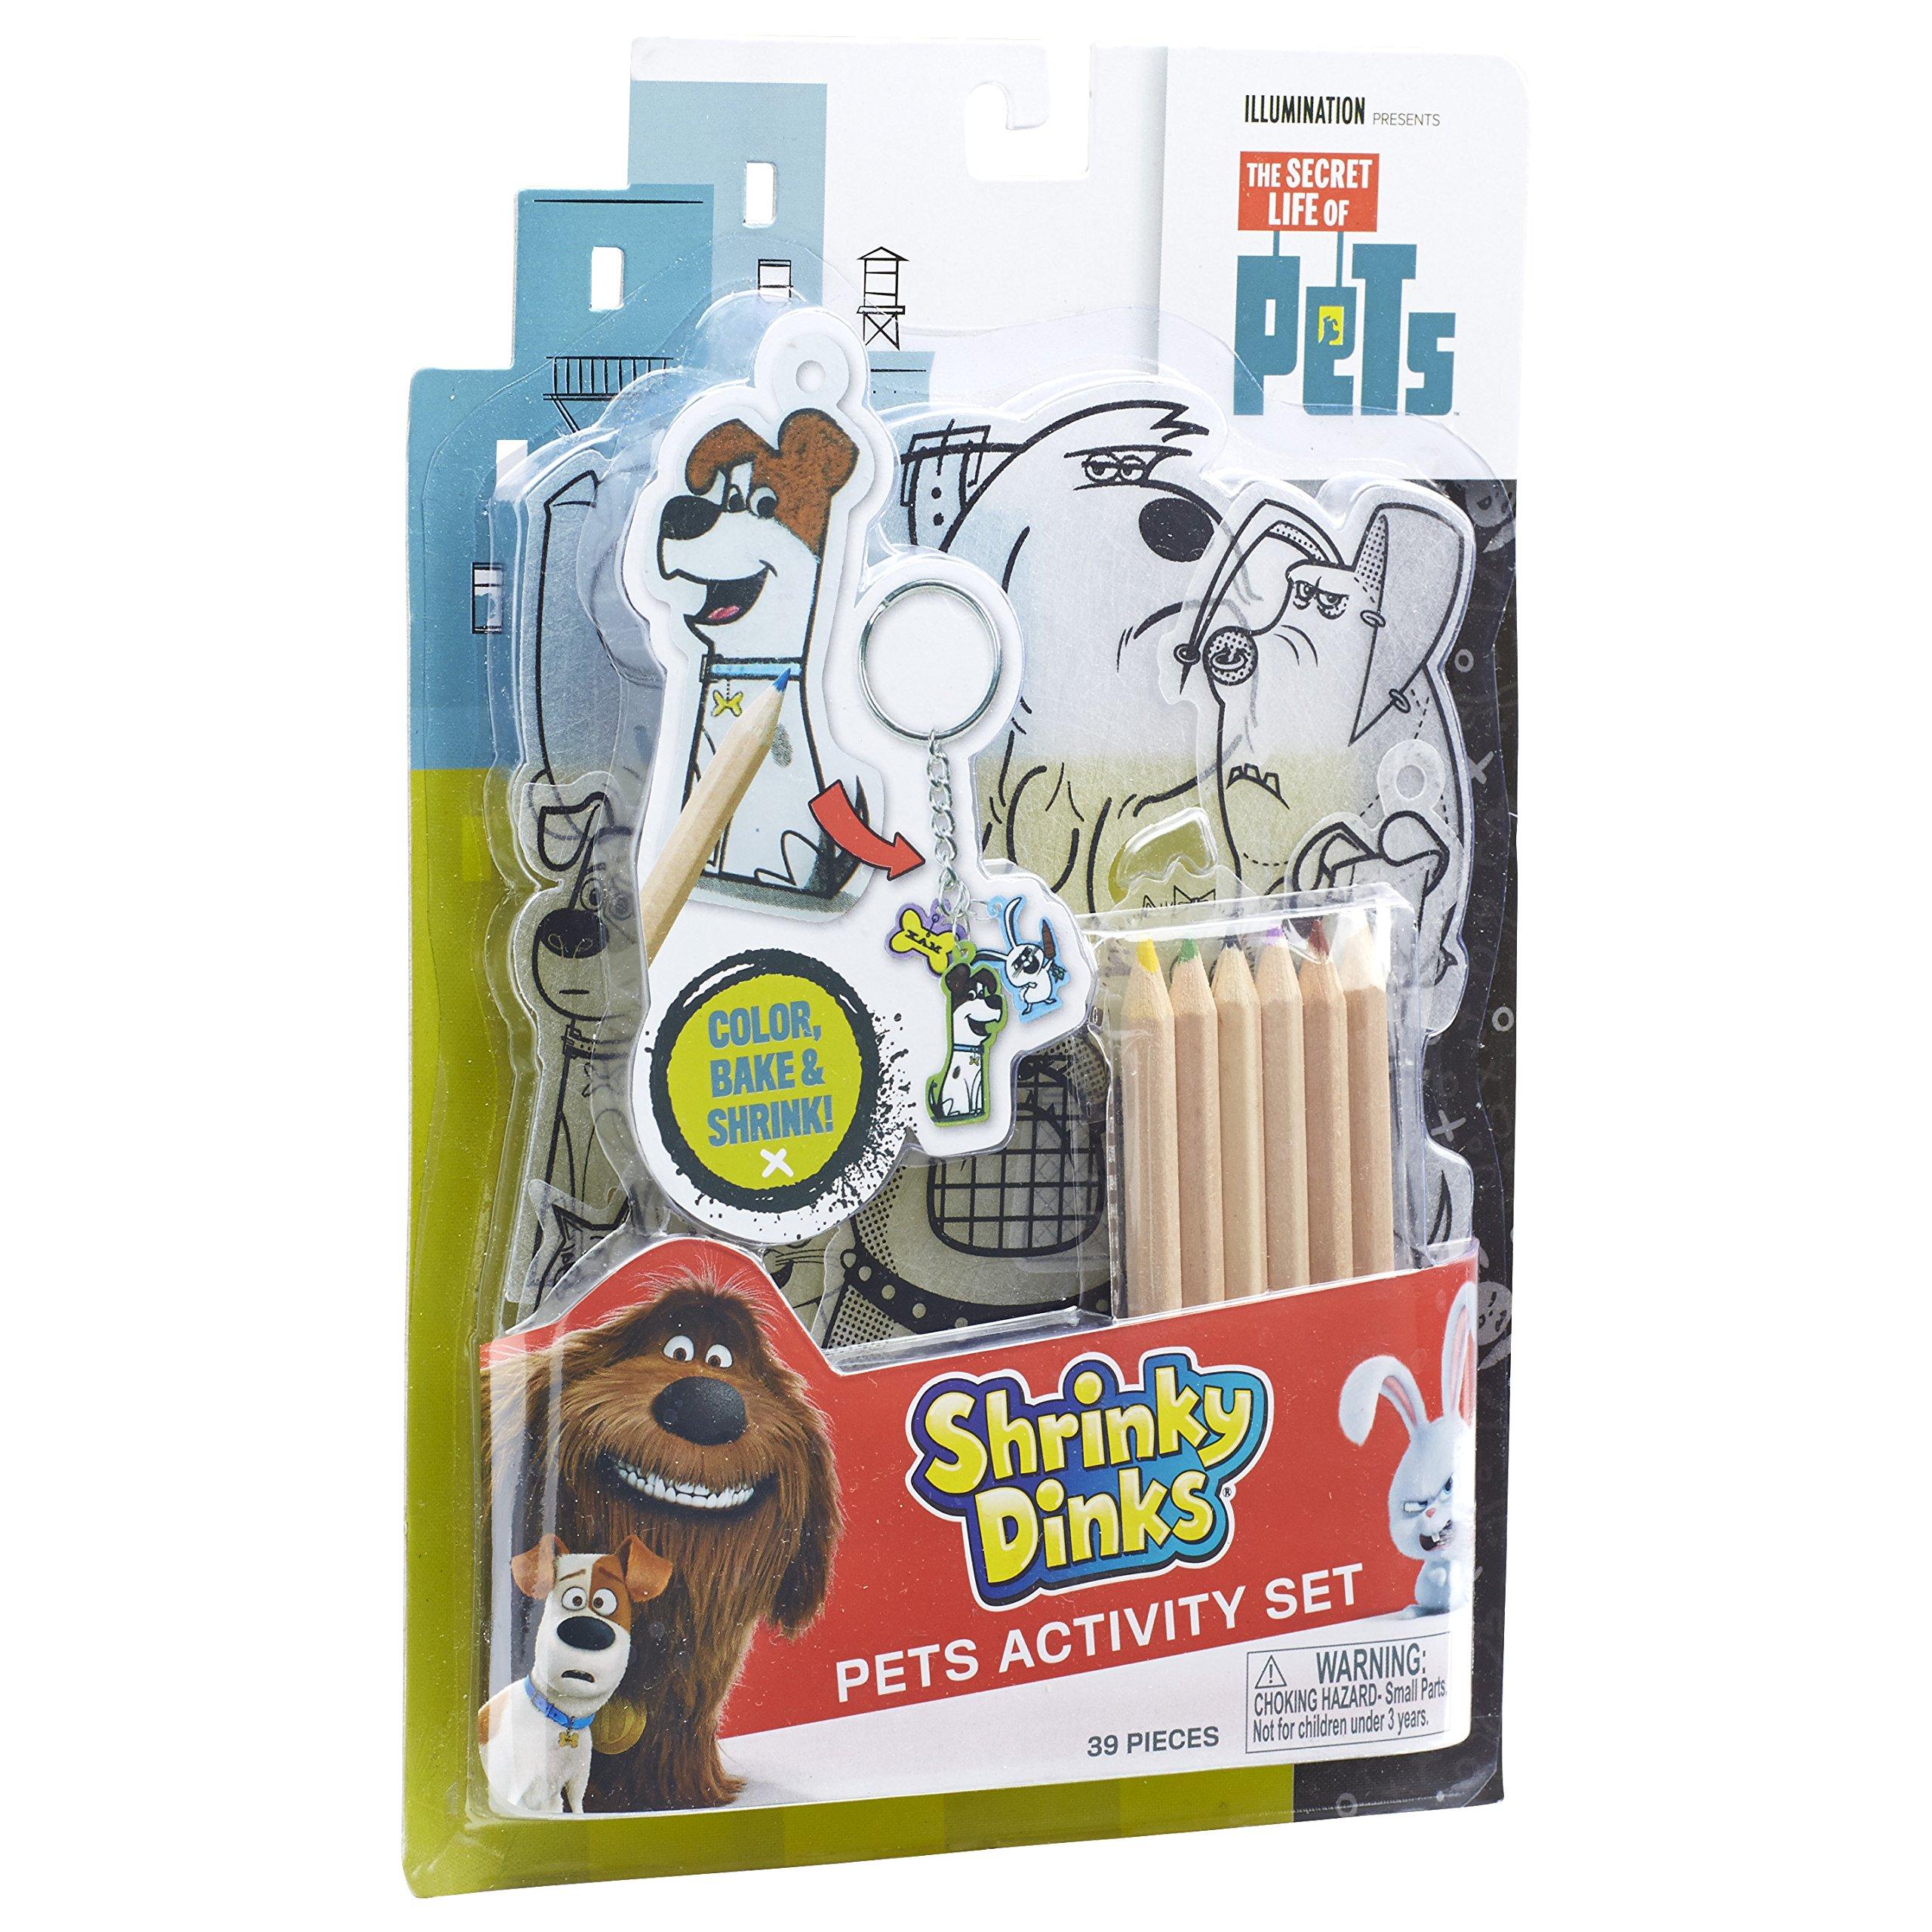 ALEX Toys The Secret Life of Pets Shrinky Dinks Activity Set